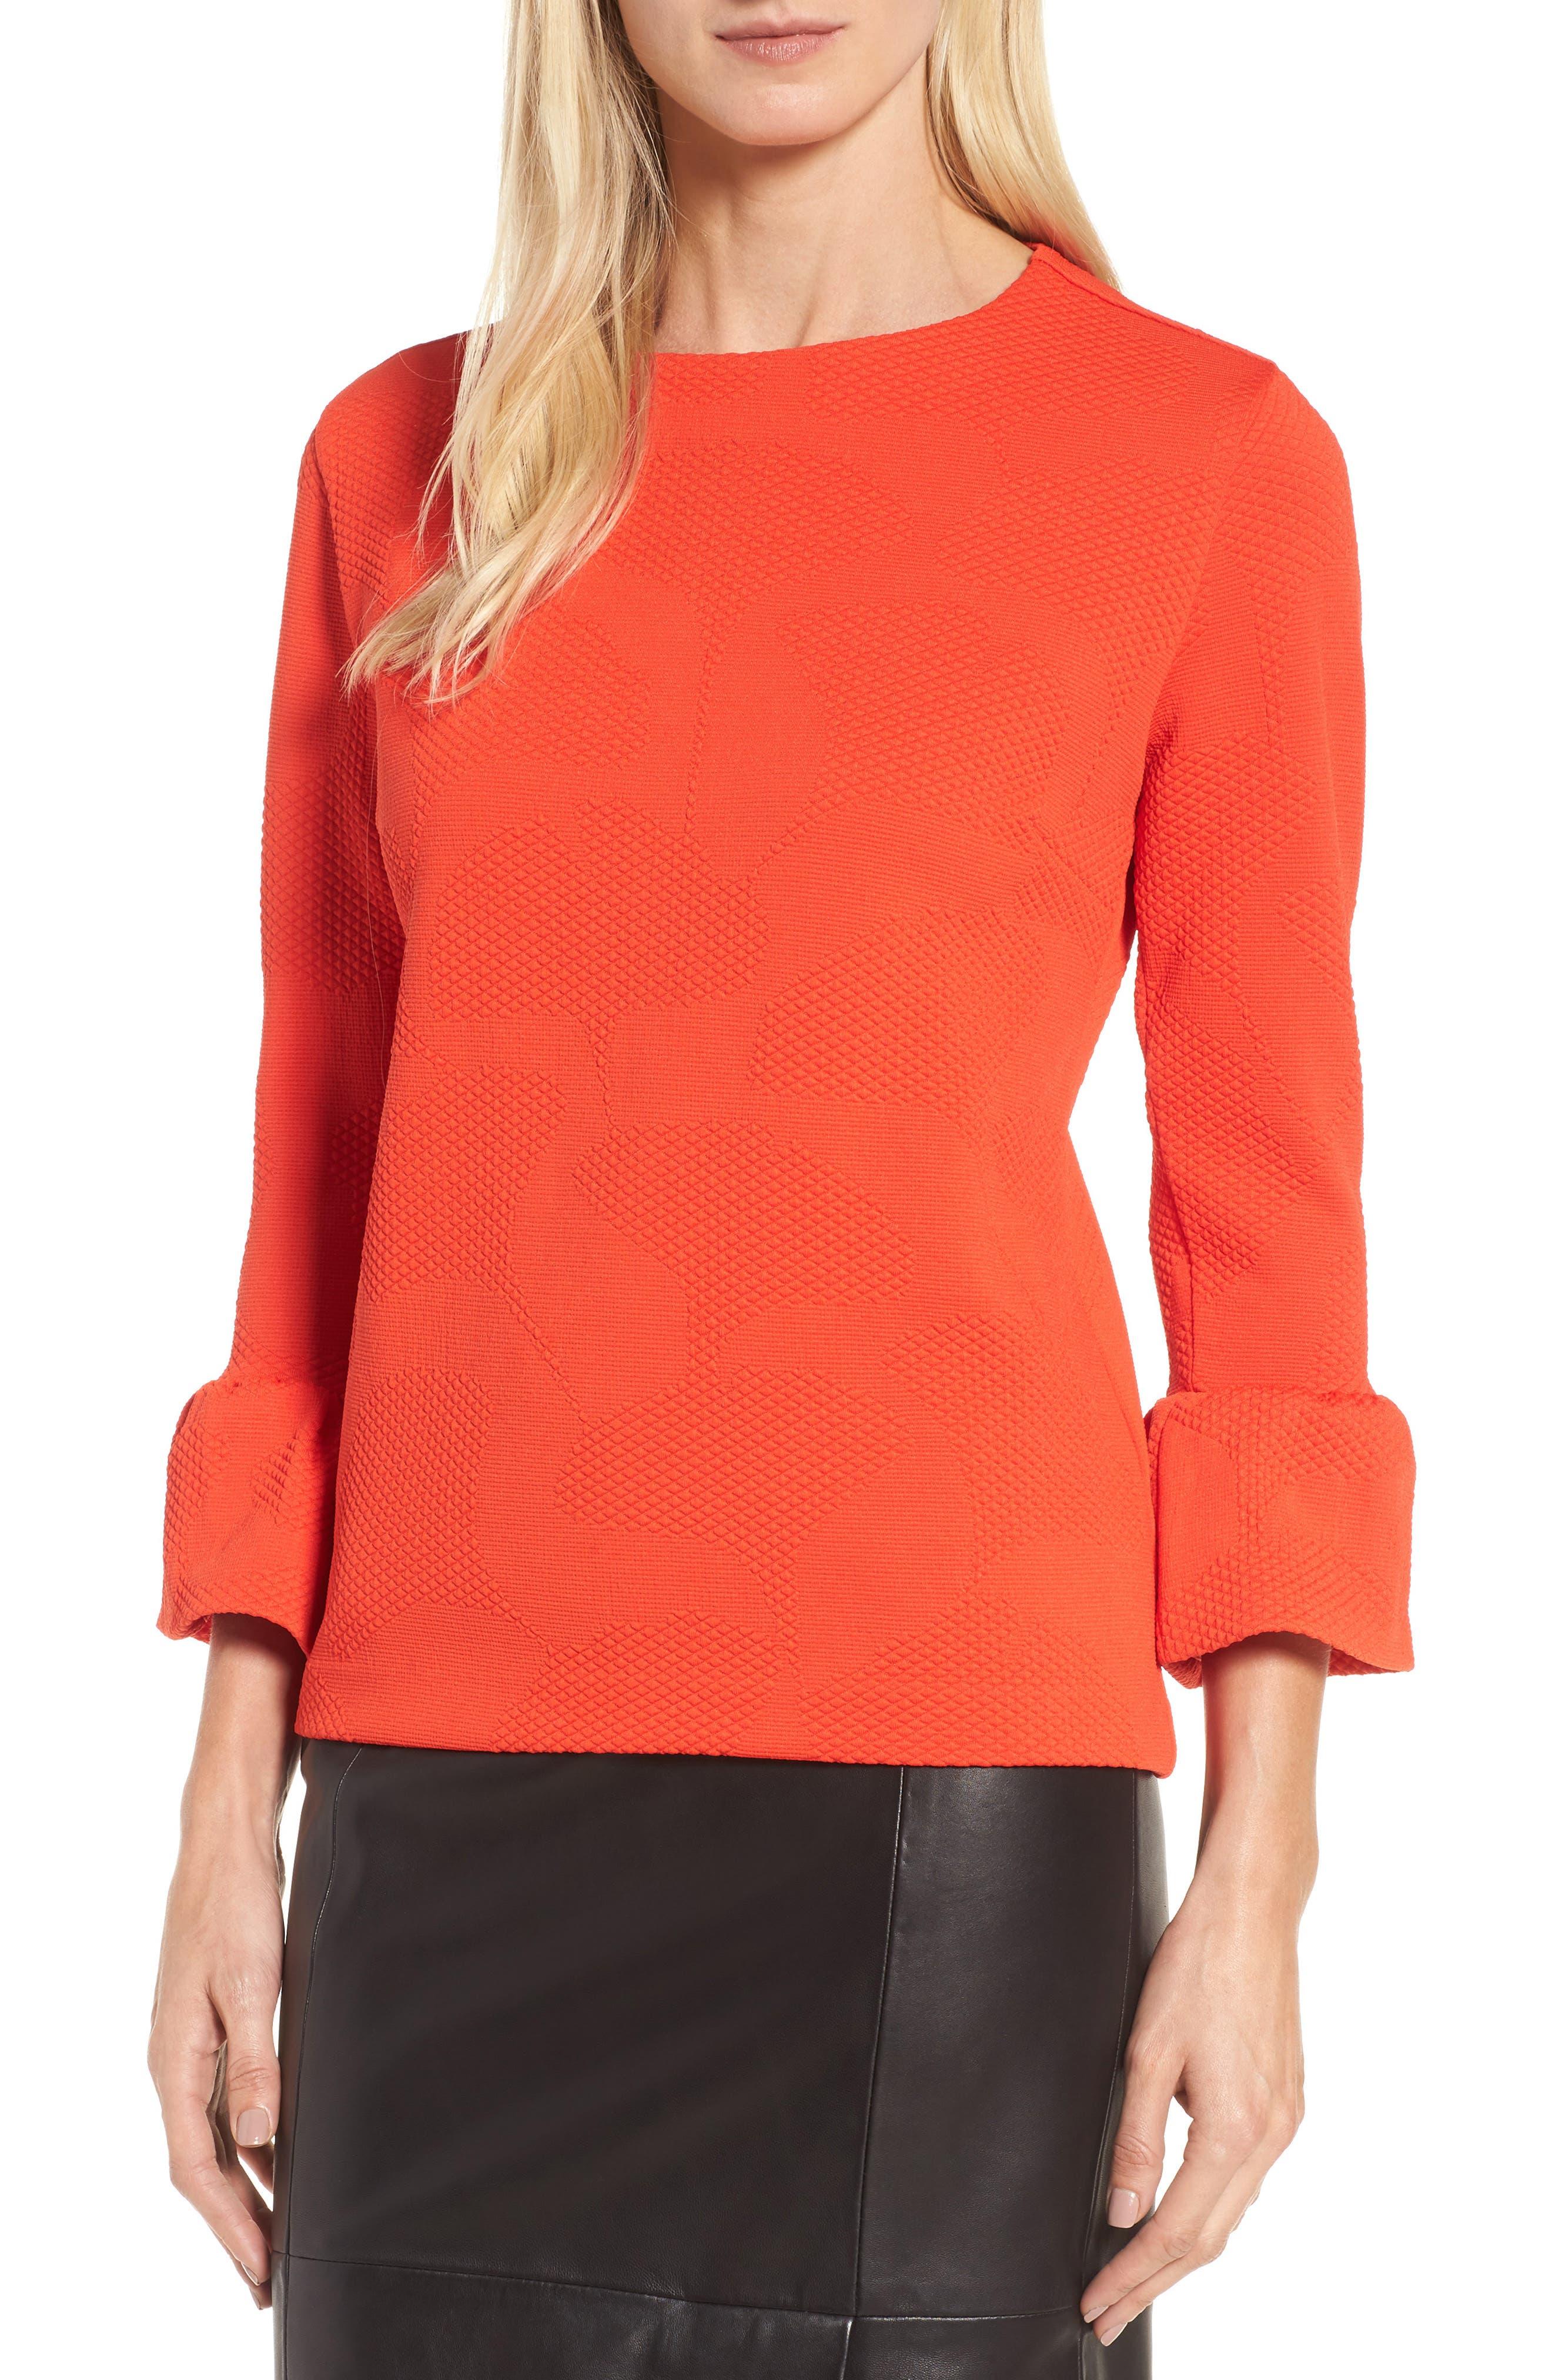 Jacquard Knit Top,                         Main,                         color,